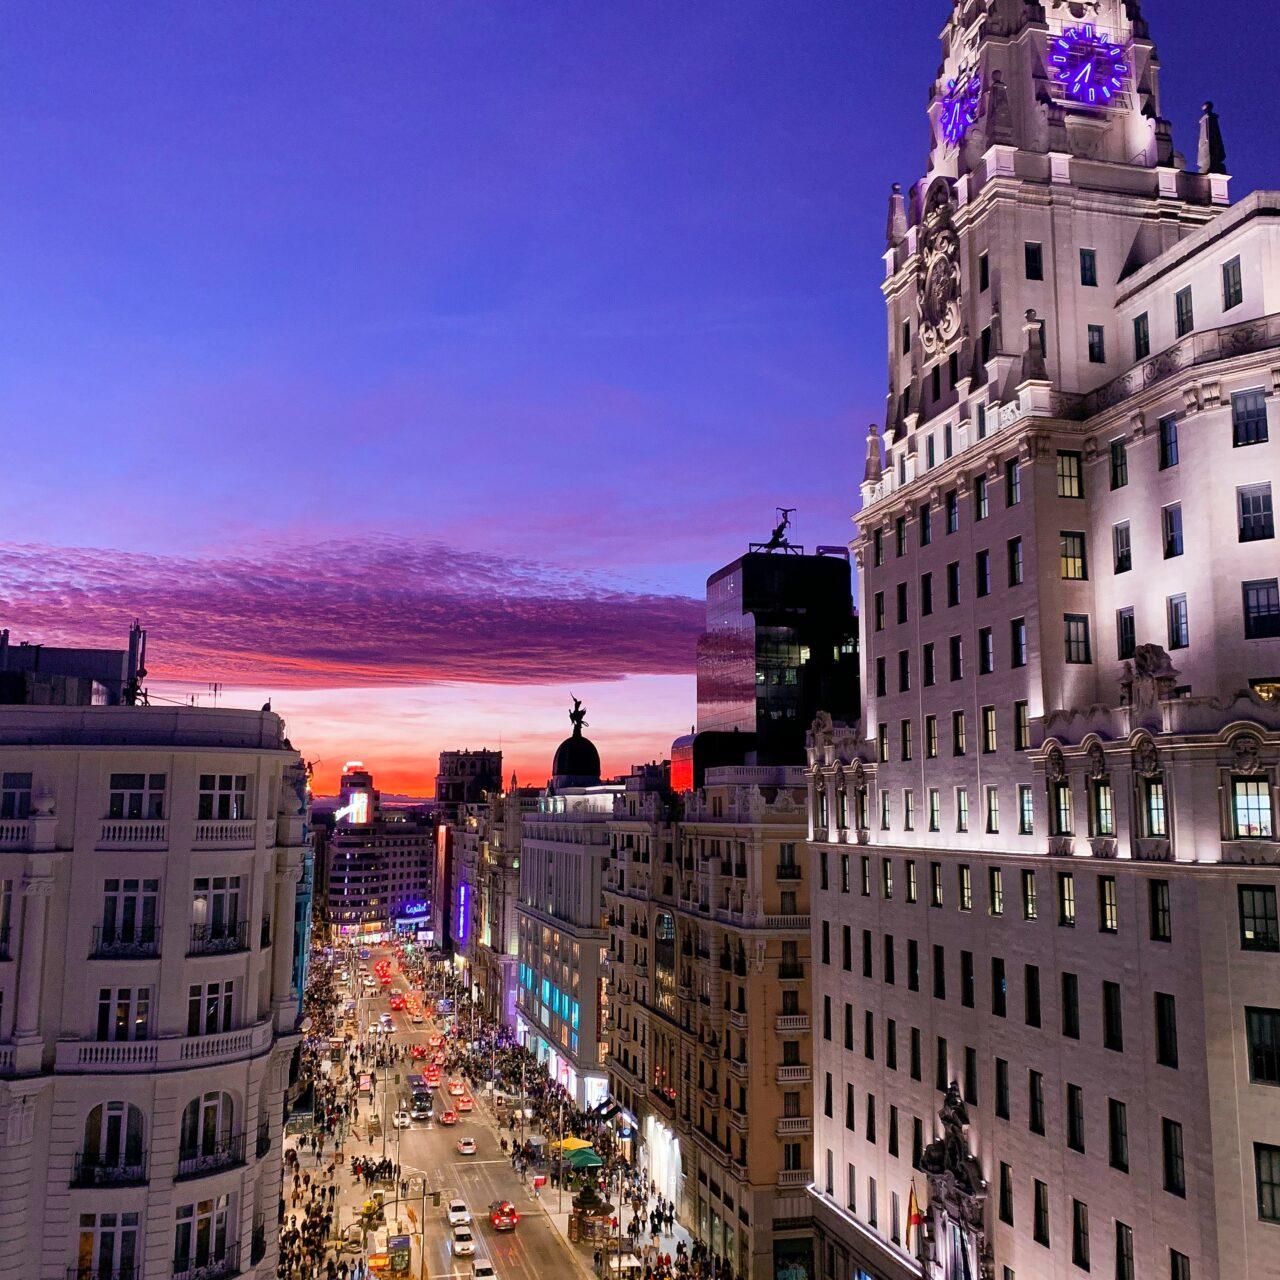 https://spanischkursspanien.de/wp-content/uploads/2020/12/alev-takil-e8k2llHEiE0-unsplash-1280x1280.jpg